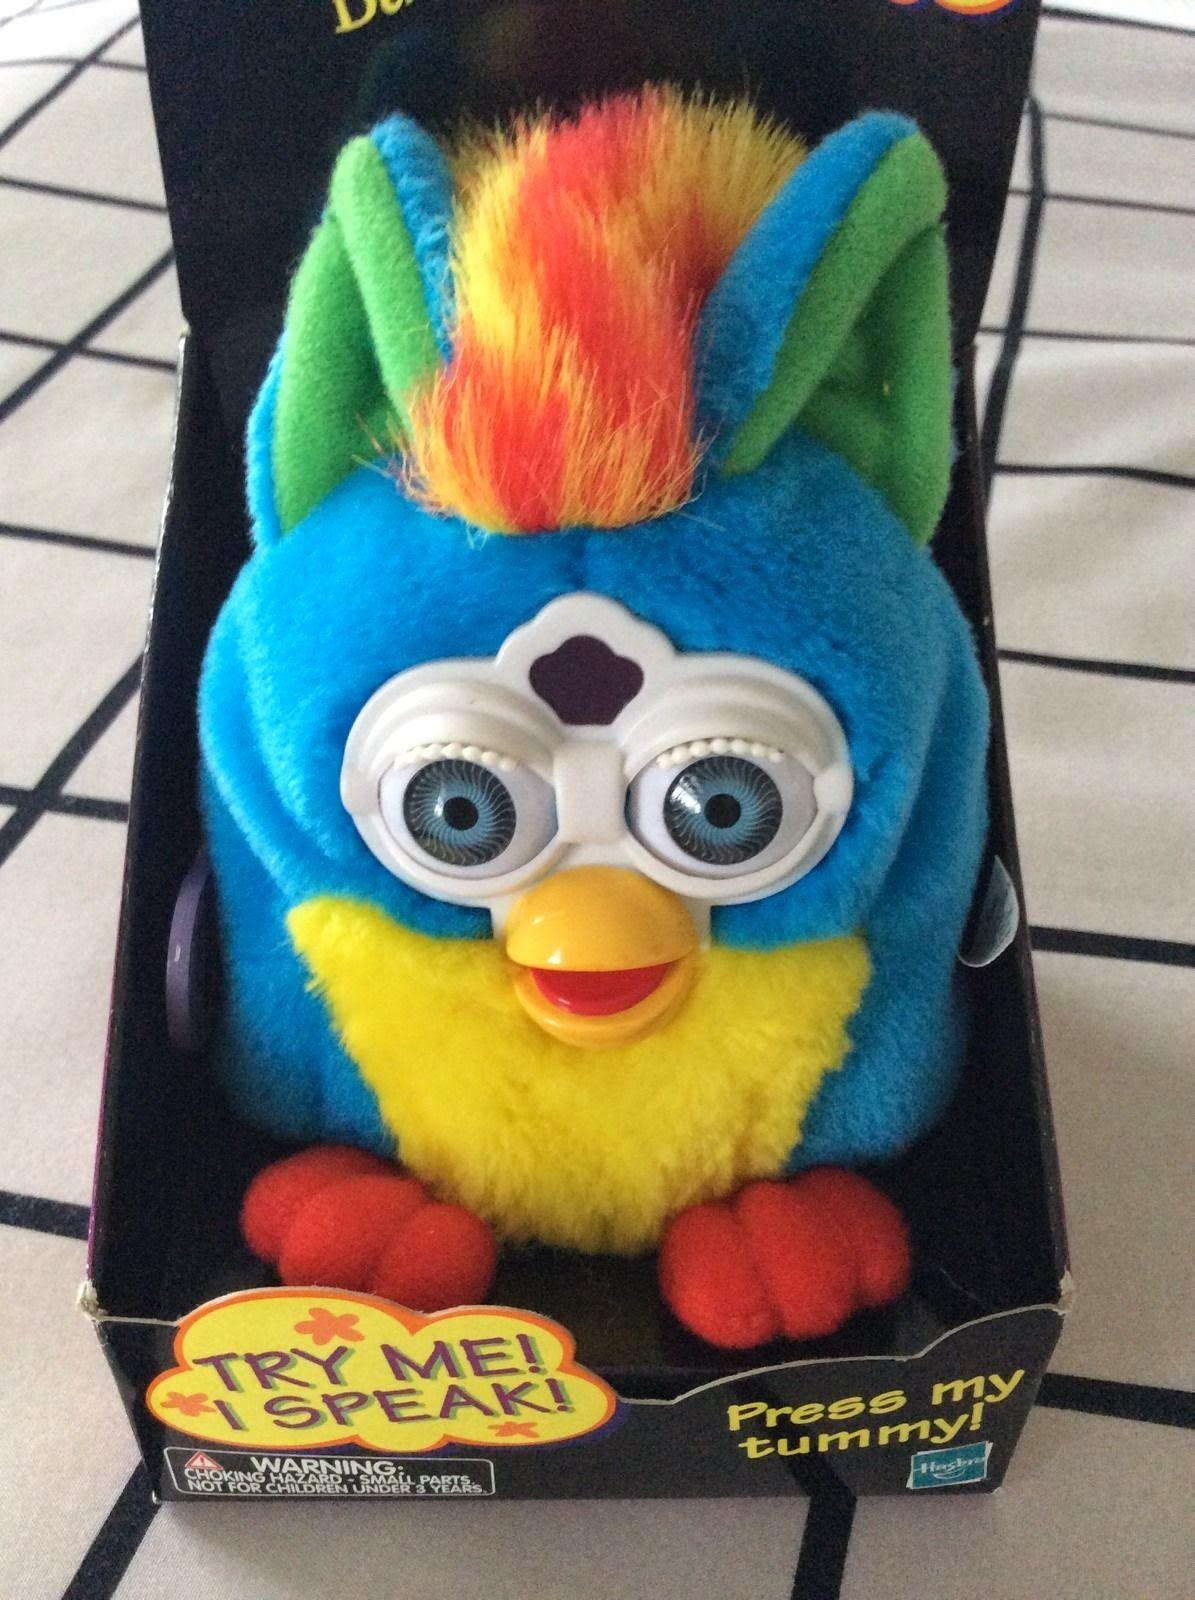 GO FURBY - #1 Resource For Original Furby Fans!: What a ...